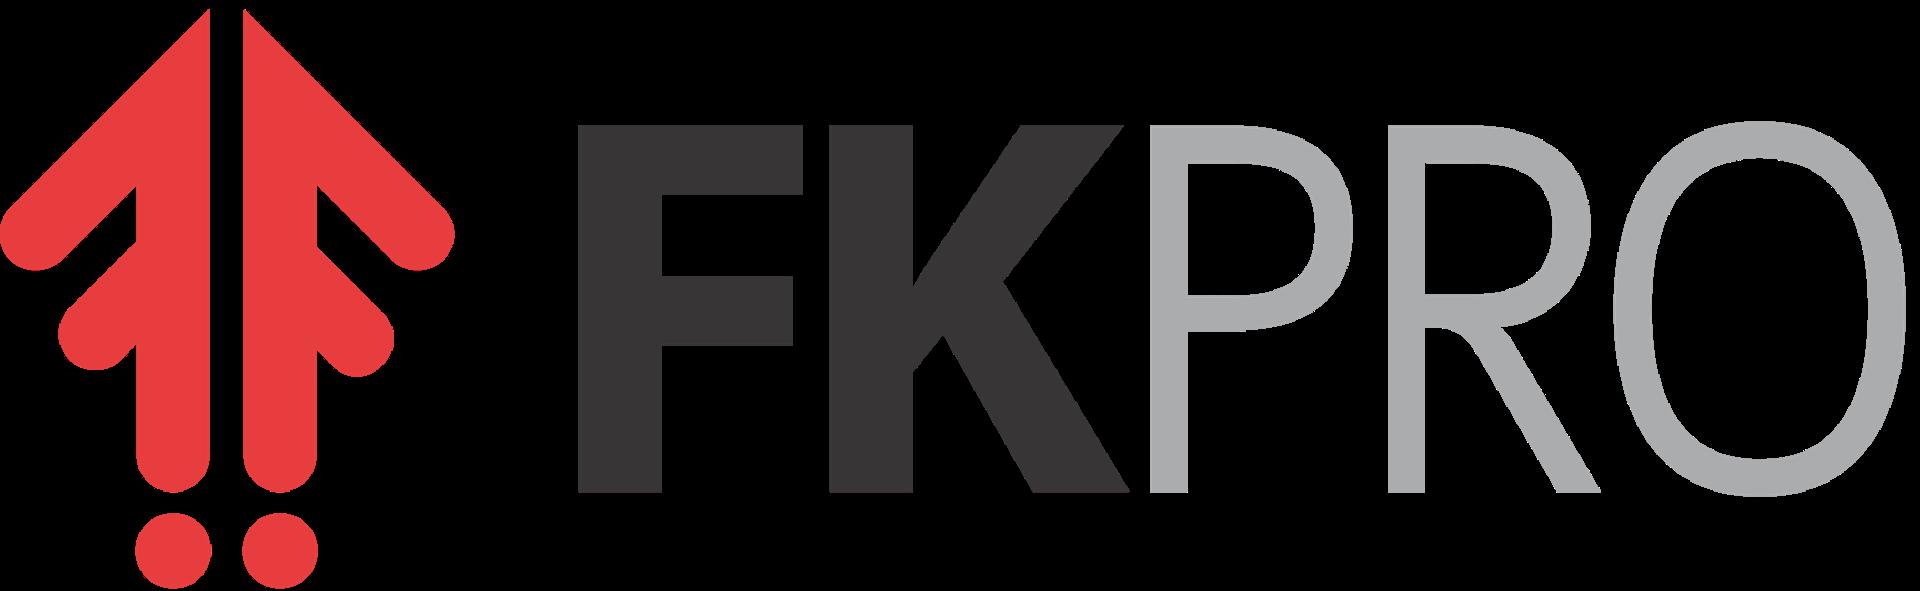 FK Pro